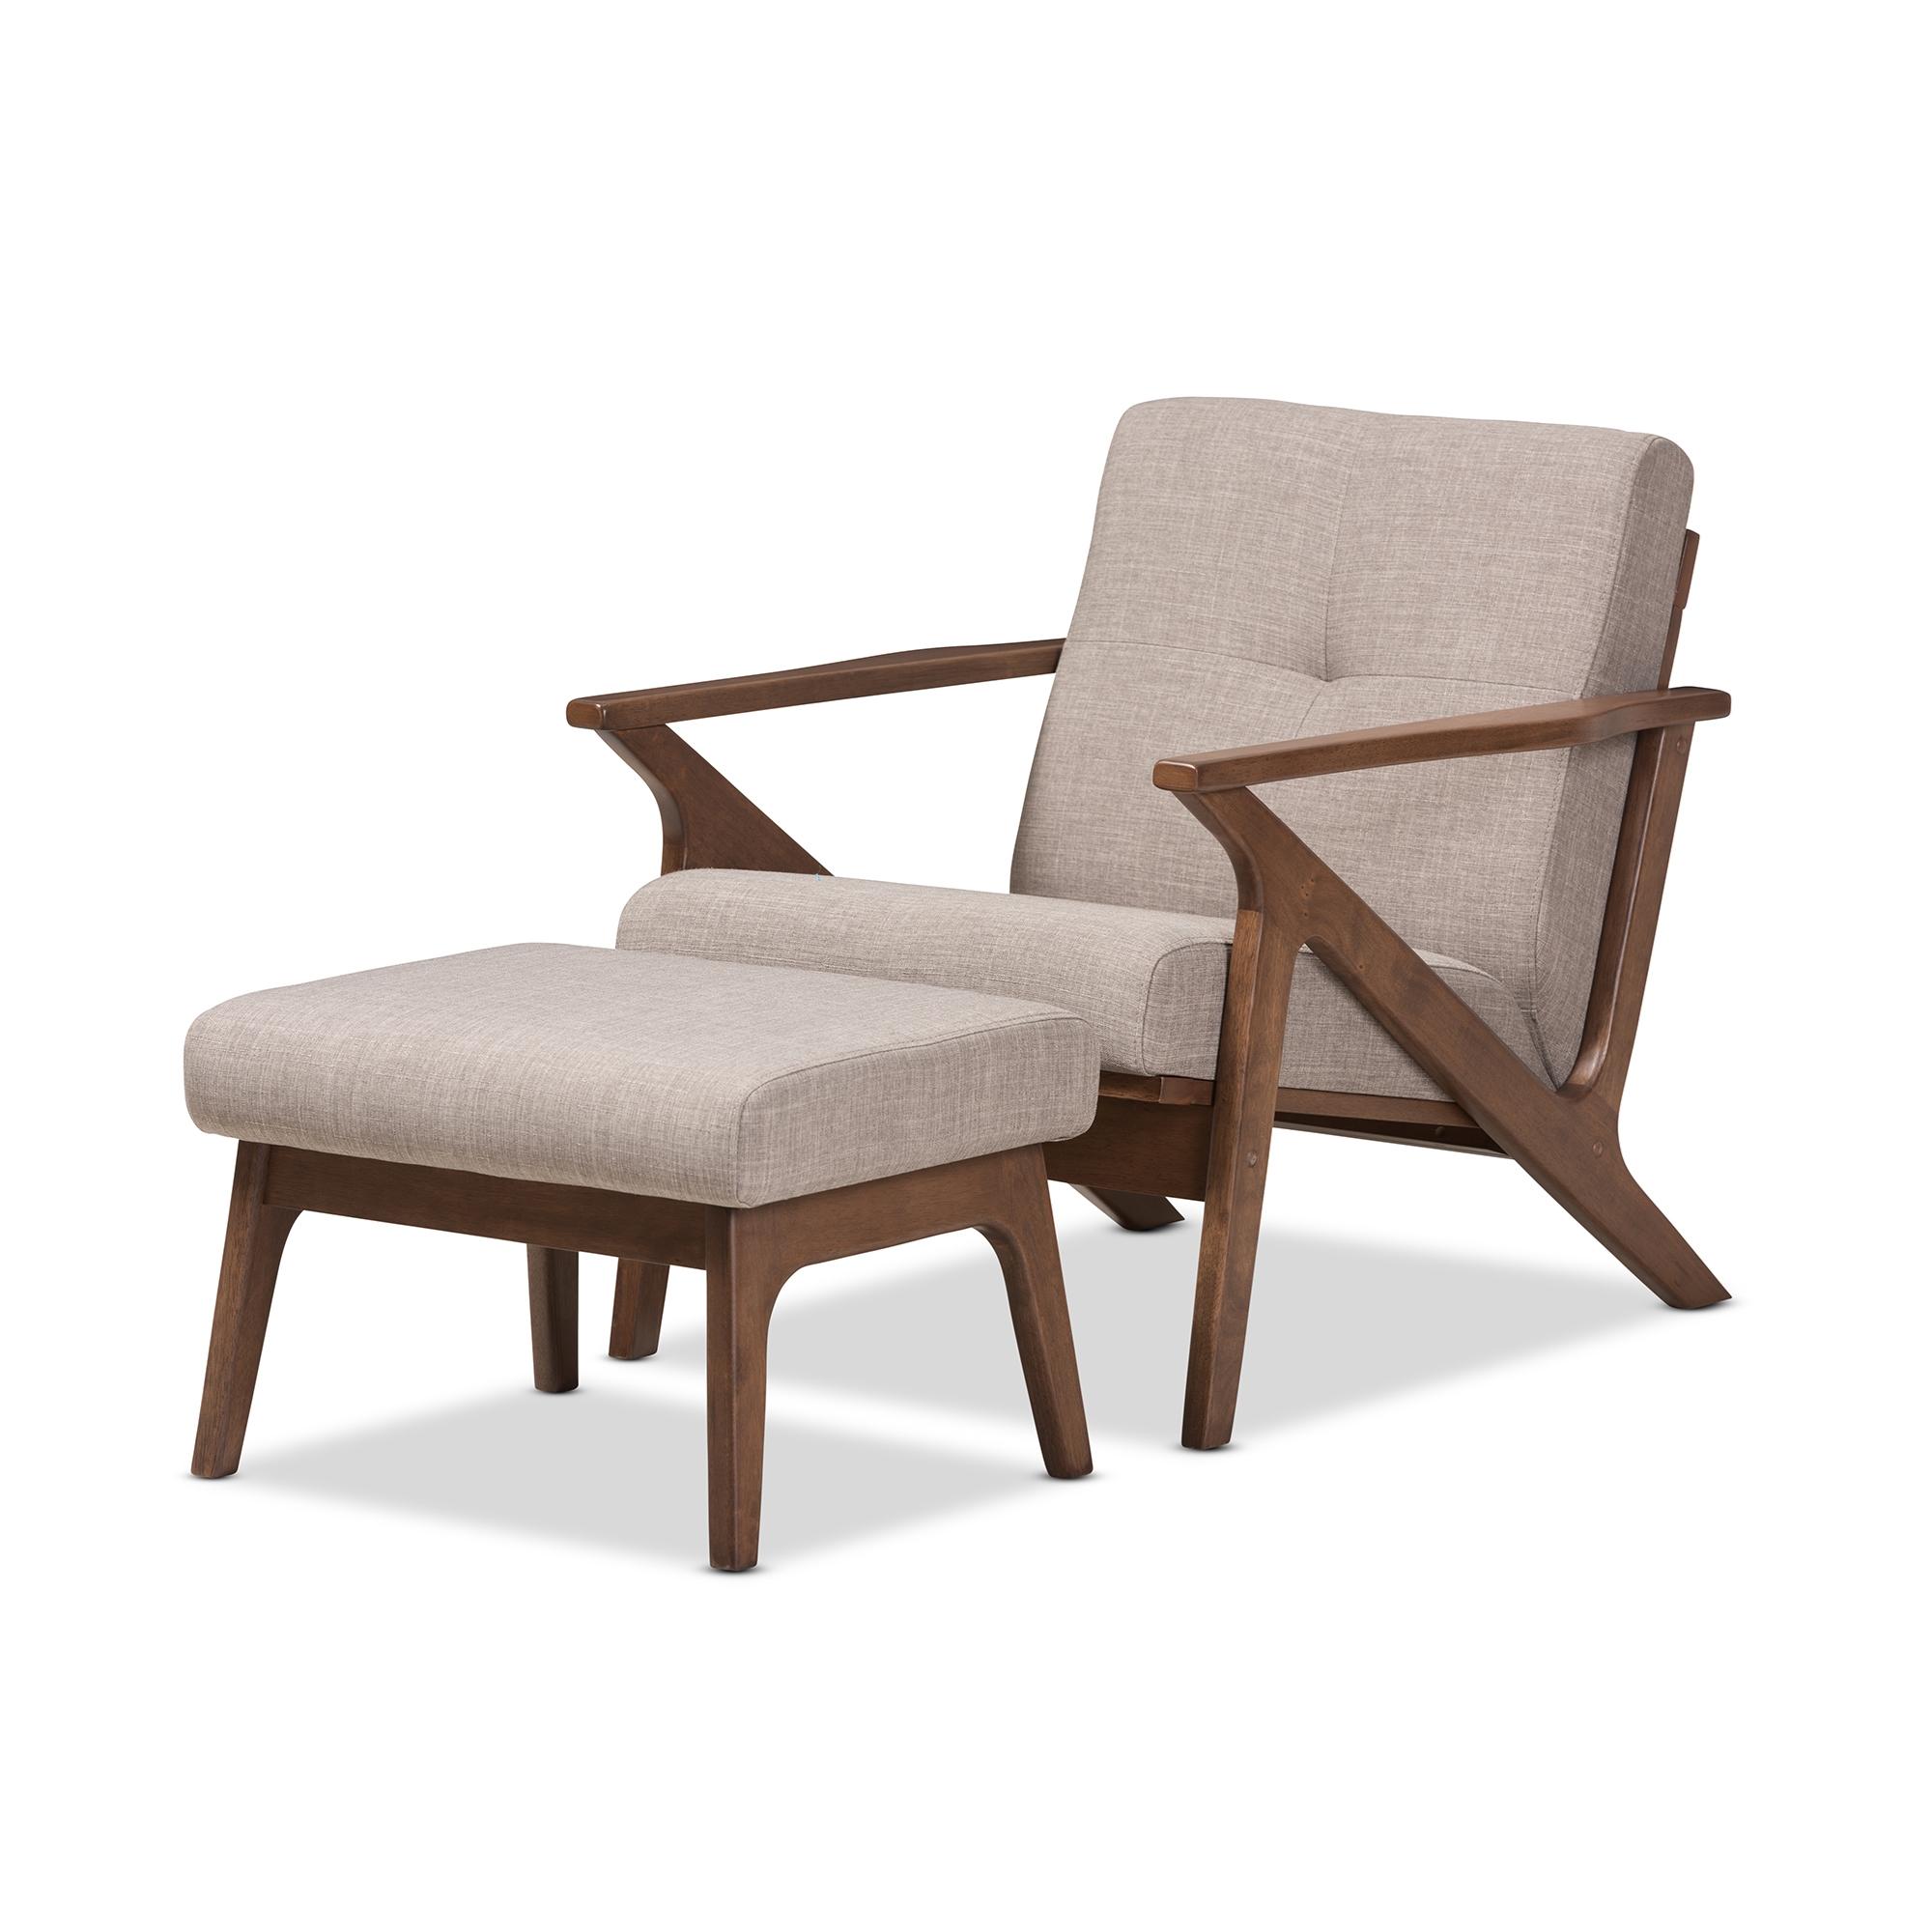 Superbe Baxton Studio Bianca Mid Century Modern Walnut Wood Light Grey Fabric Tufted  Lounge Chair And Ottoman Set